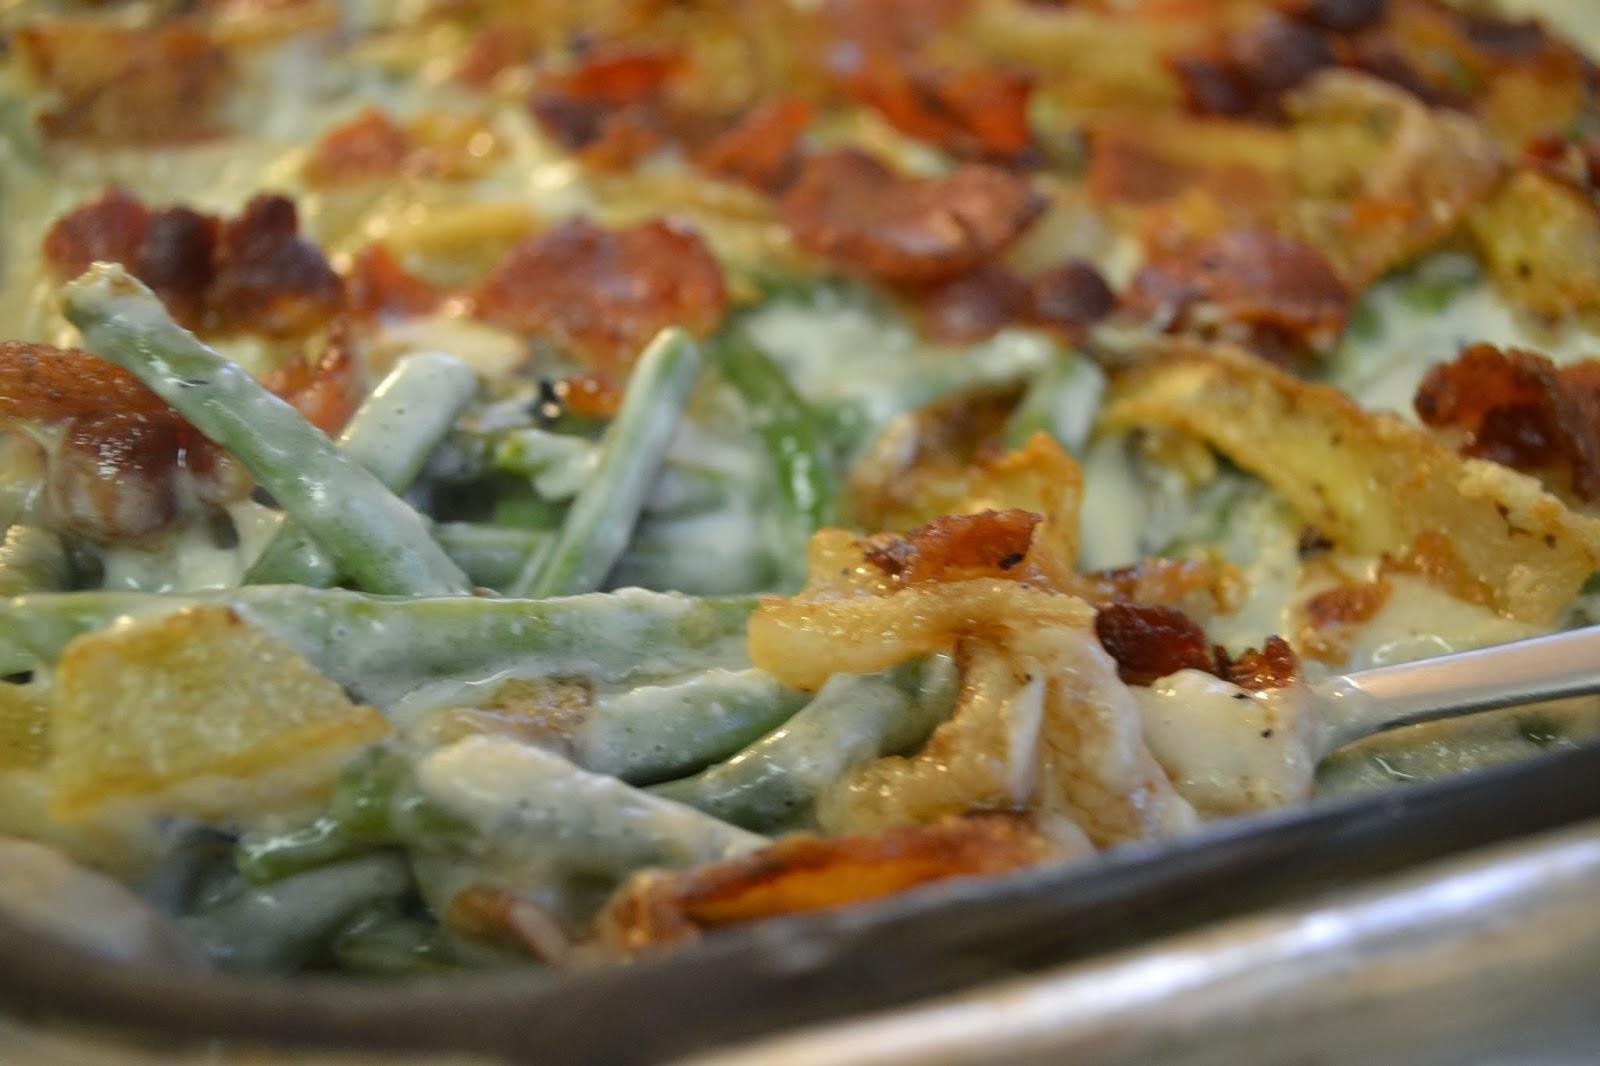 ... of a Fabulous Life: Gluten Free, Dairy Free Green Bean Casserole